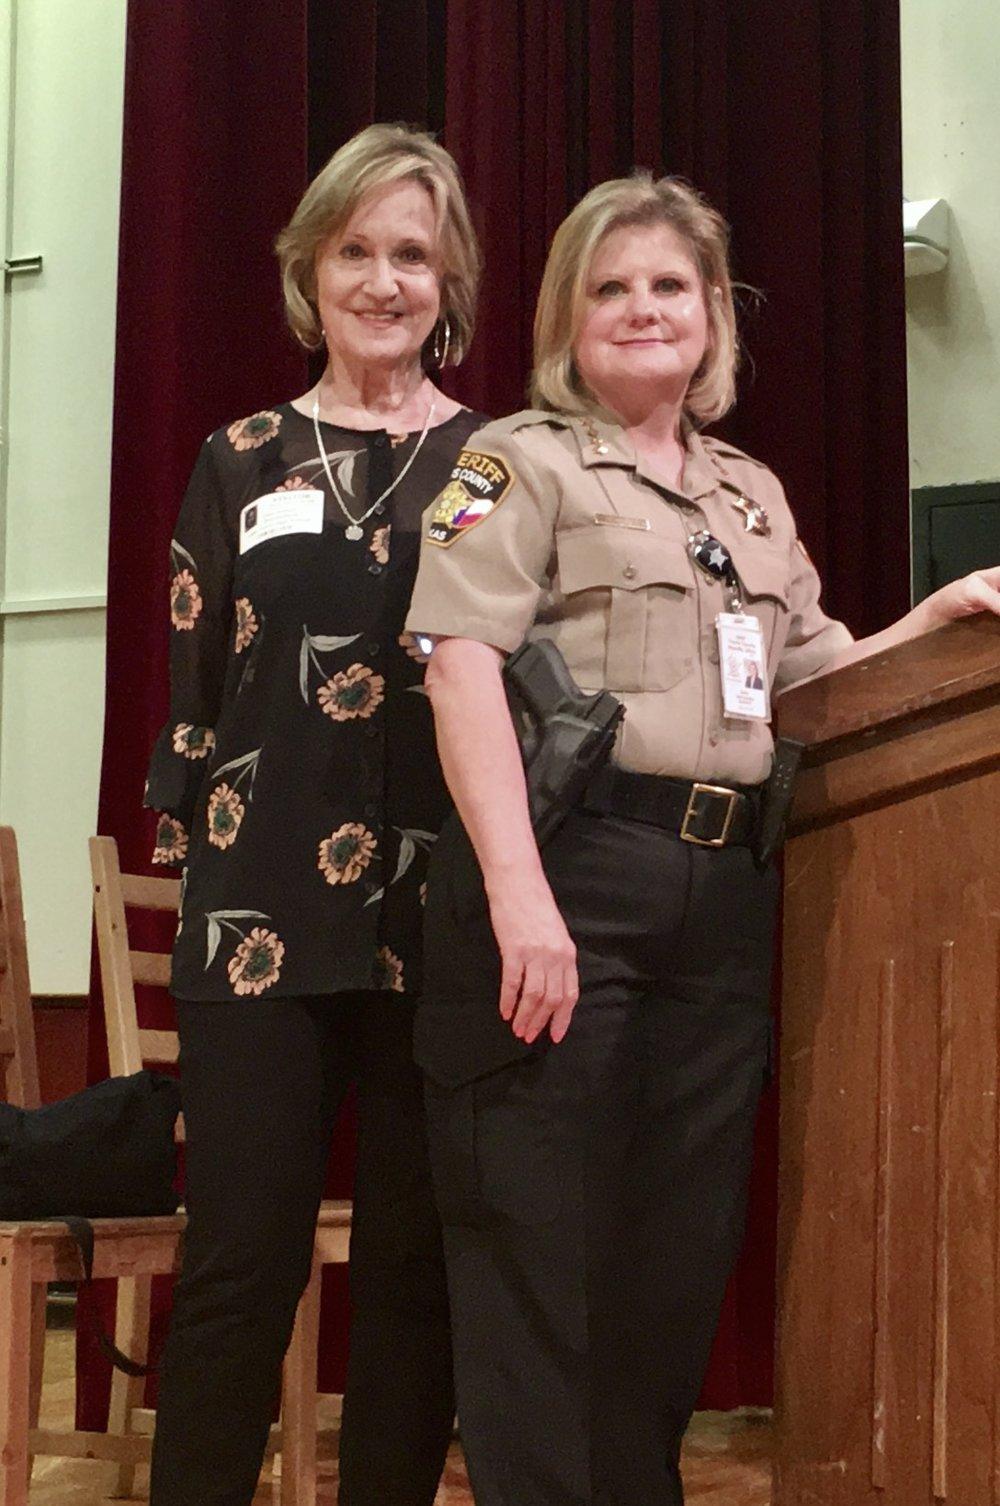 Ellen Halbert (left), former Director of Victim Services, and Sally Hernandez (right) TravisCounty Sheriff